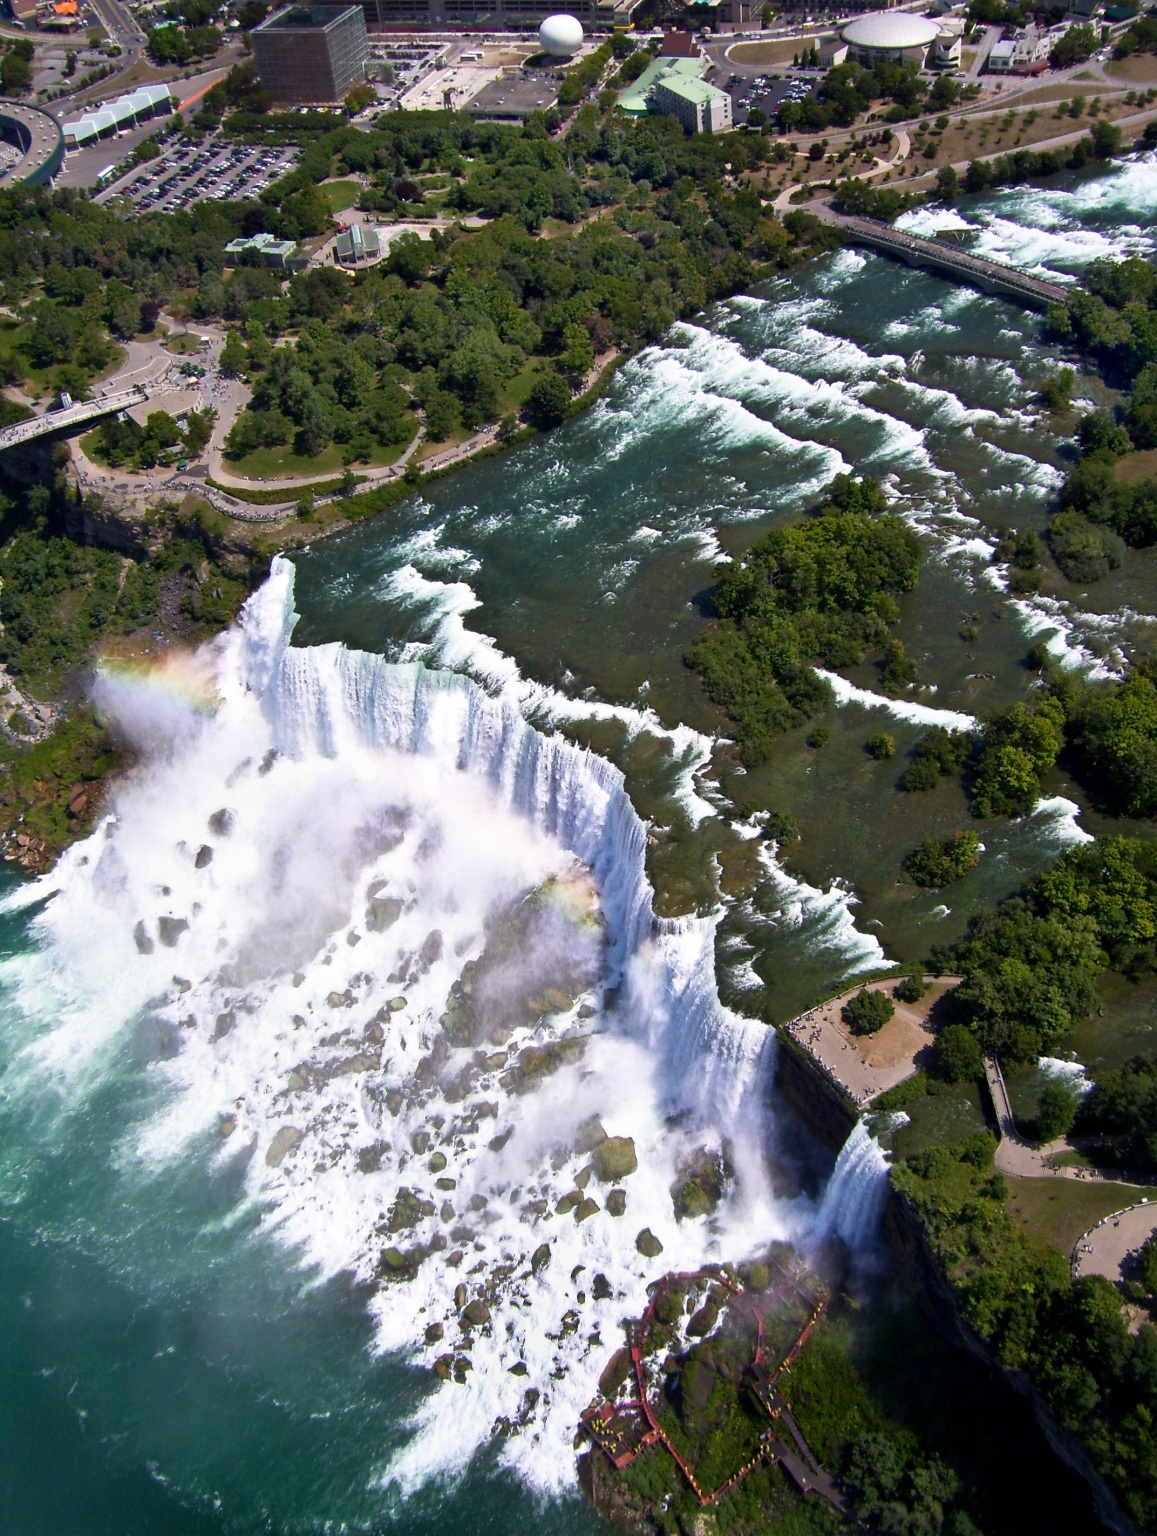 Niagara Falls copyright 2009 Daniel D.Teoli Jr. mr